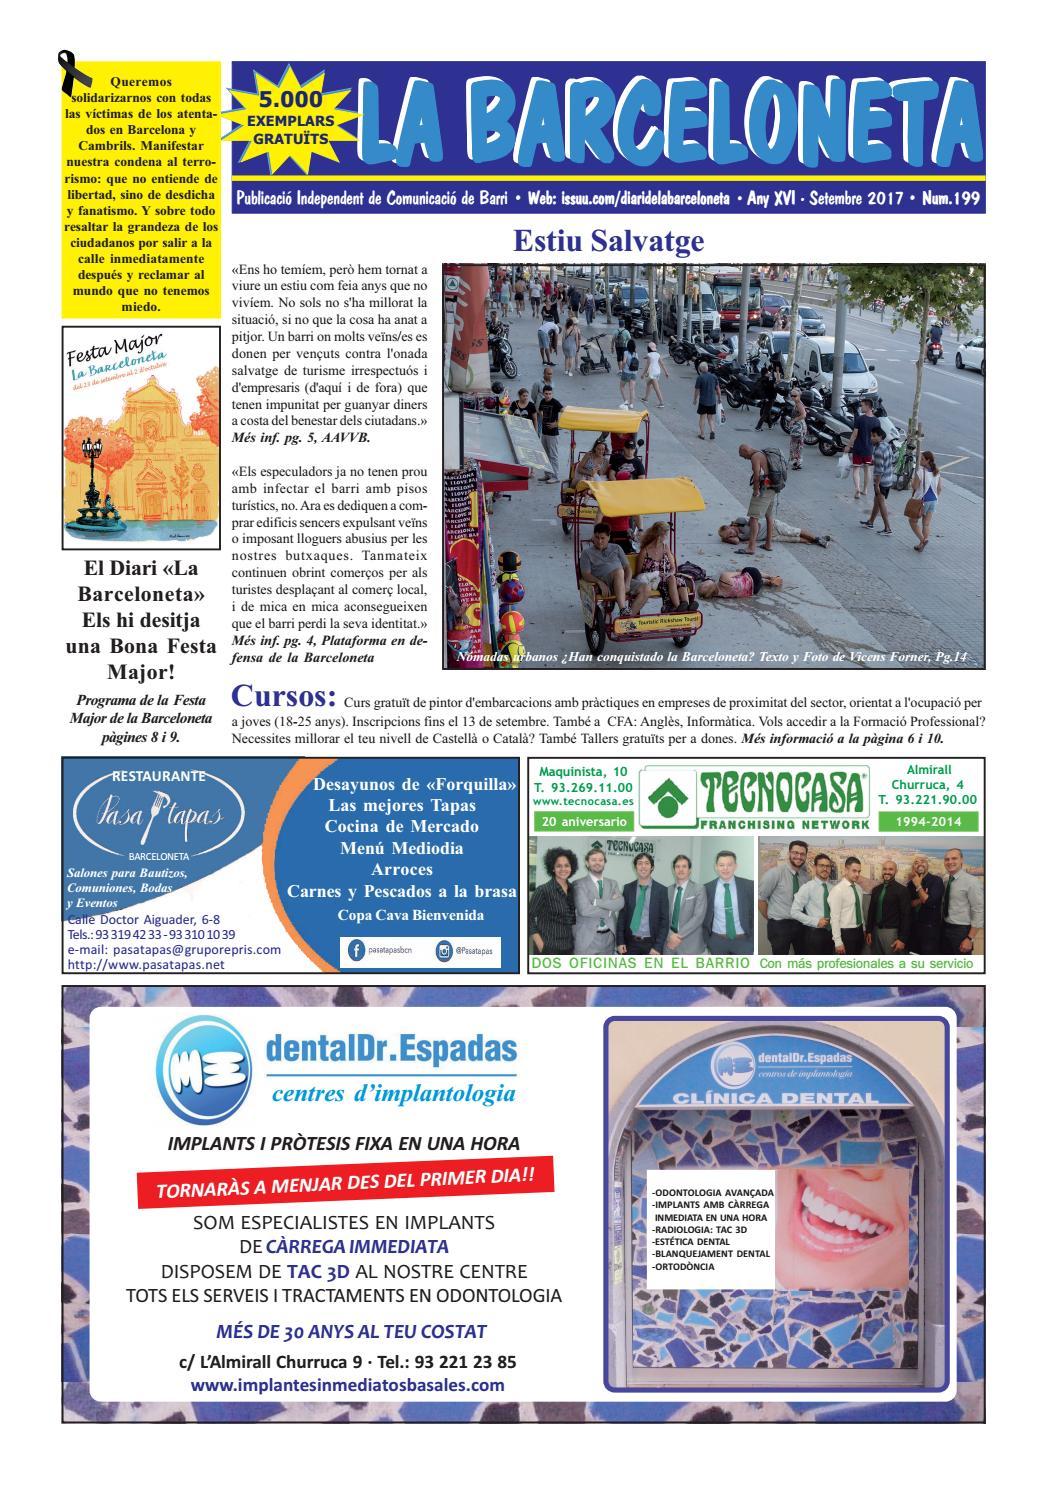 Diari De La Barceloneta Setembre 2017 By Diari Barceloneta